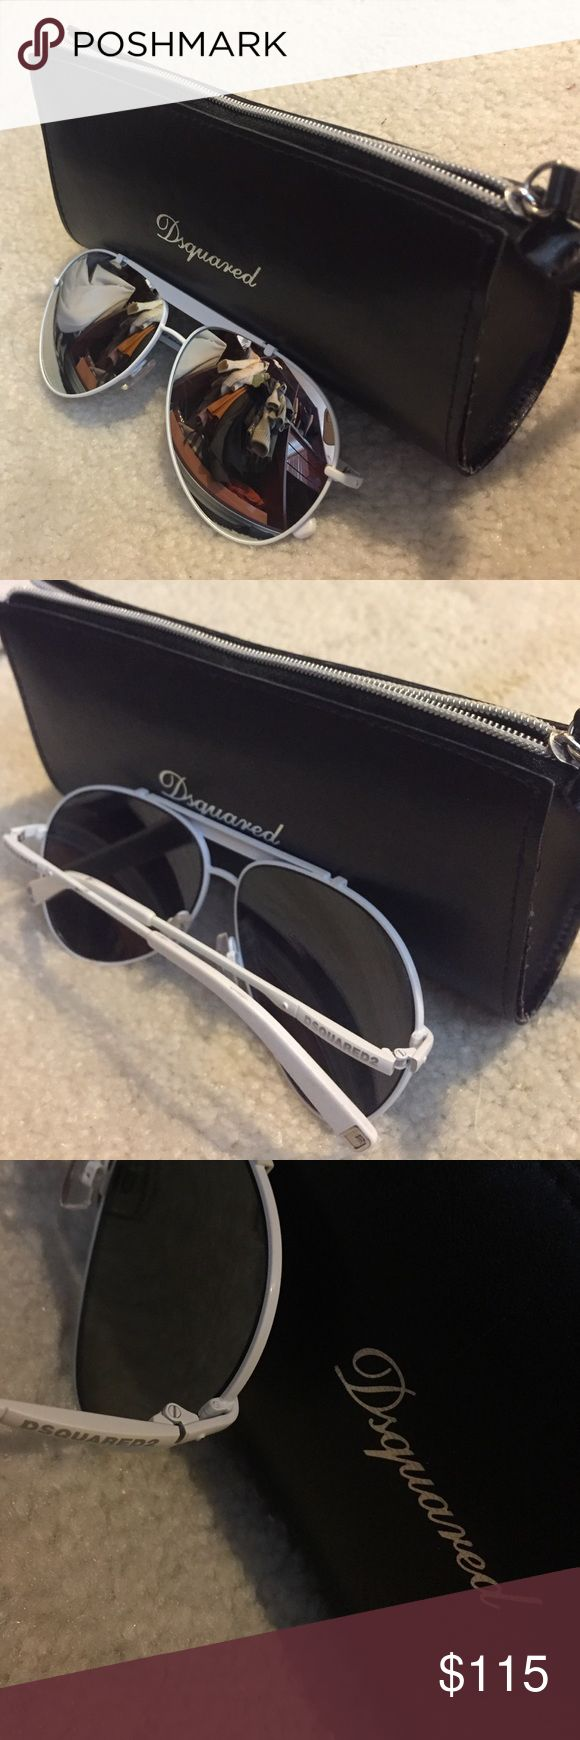 Dsquared Sunglasses Beautiful reflective sunglasses, worn a few times! DSQUARED Accessories Sunglasses